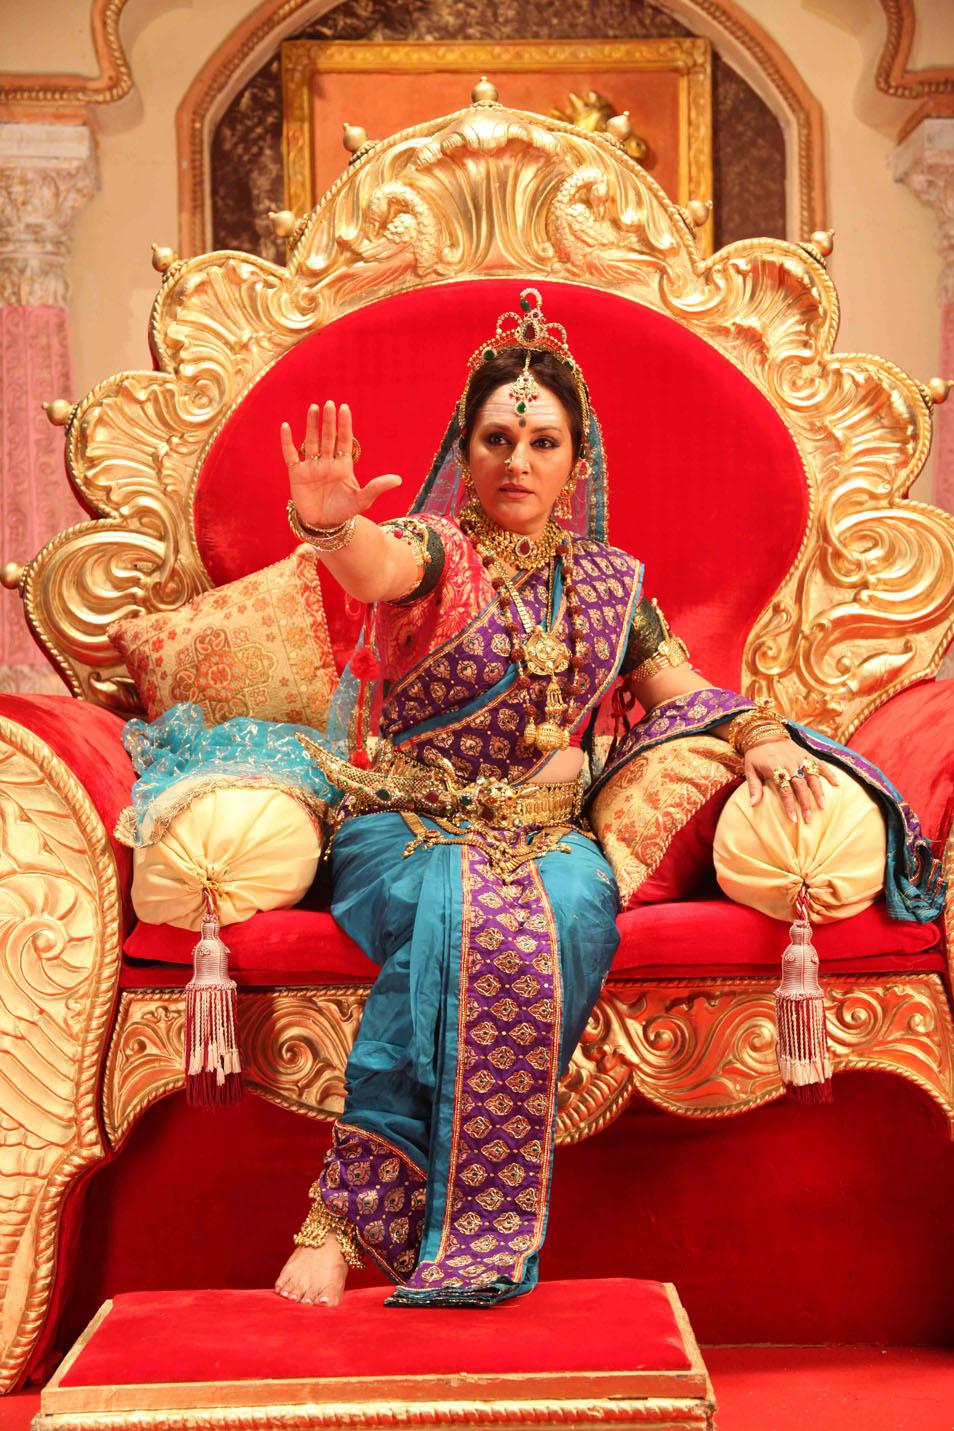 Darshan Sangoli Rayanna Photos Kannada Movie 2011 Stills -3281